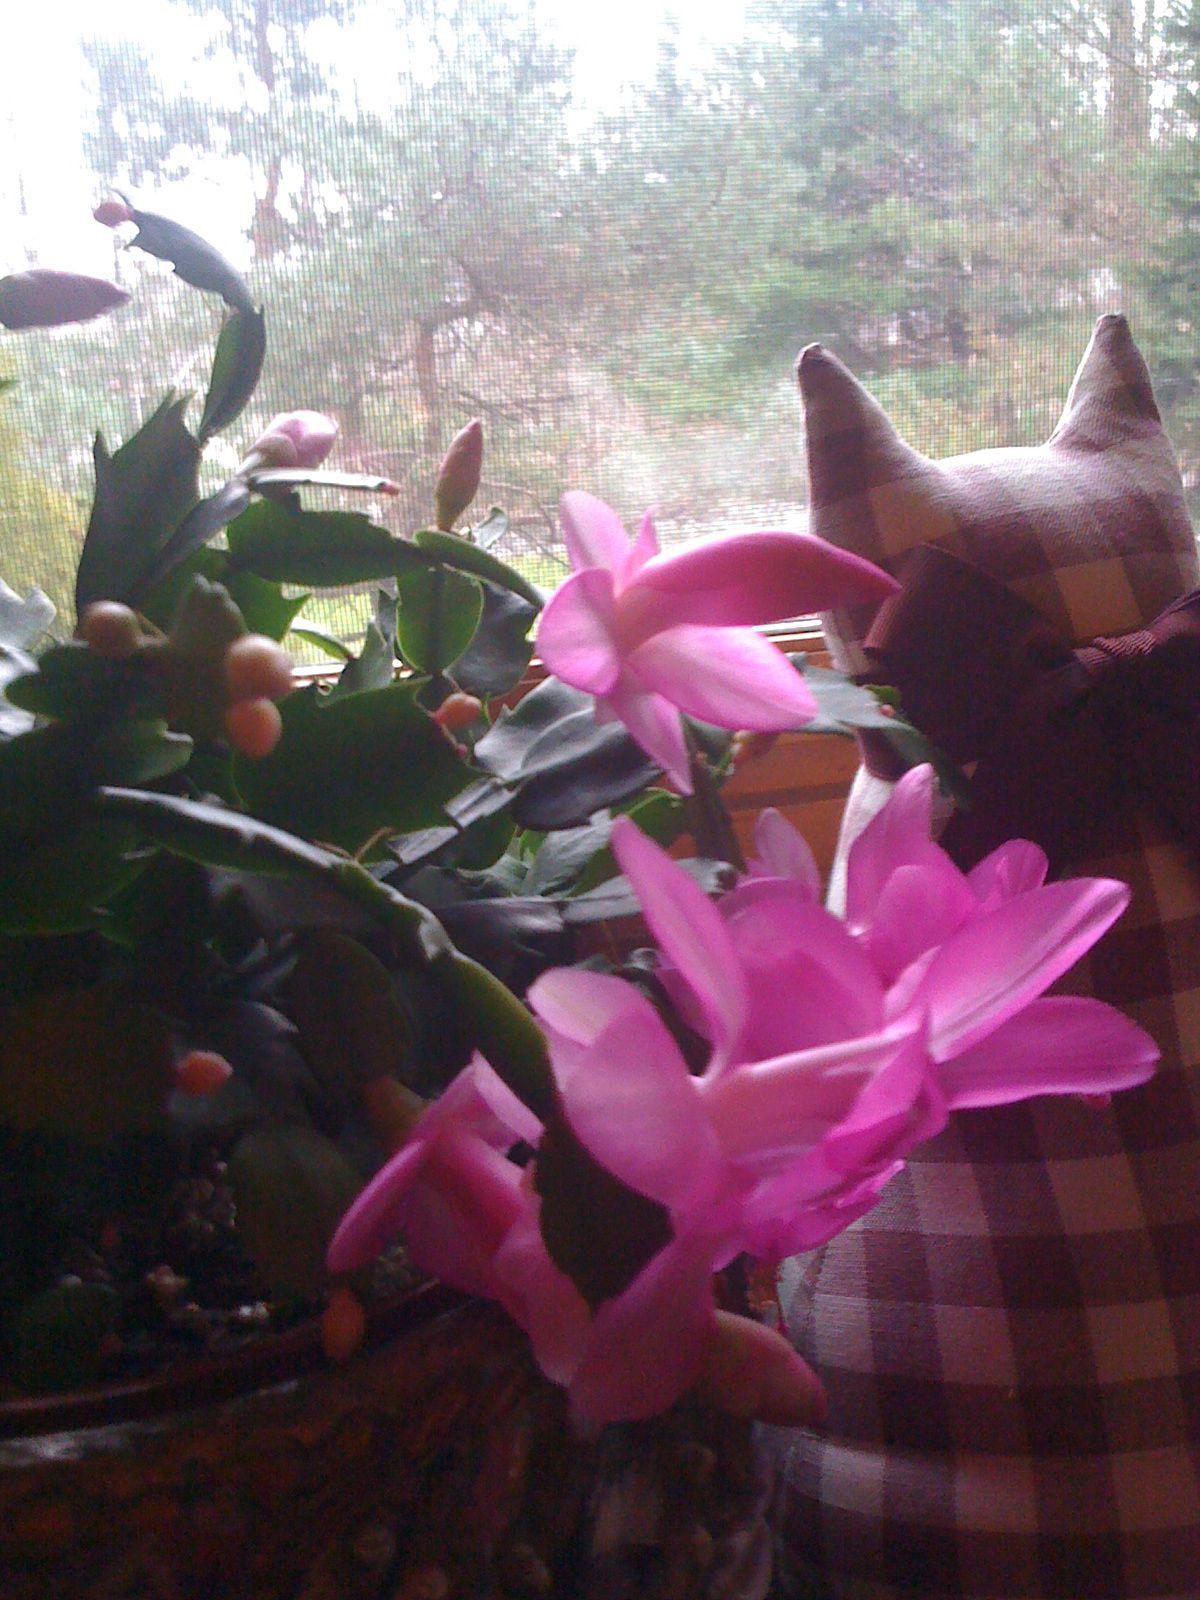 discover ideas about window ledge decor window ledge decor christmas cactus calico cat